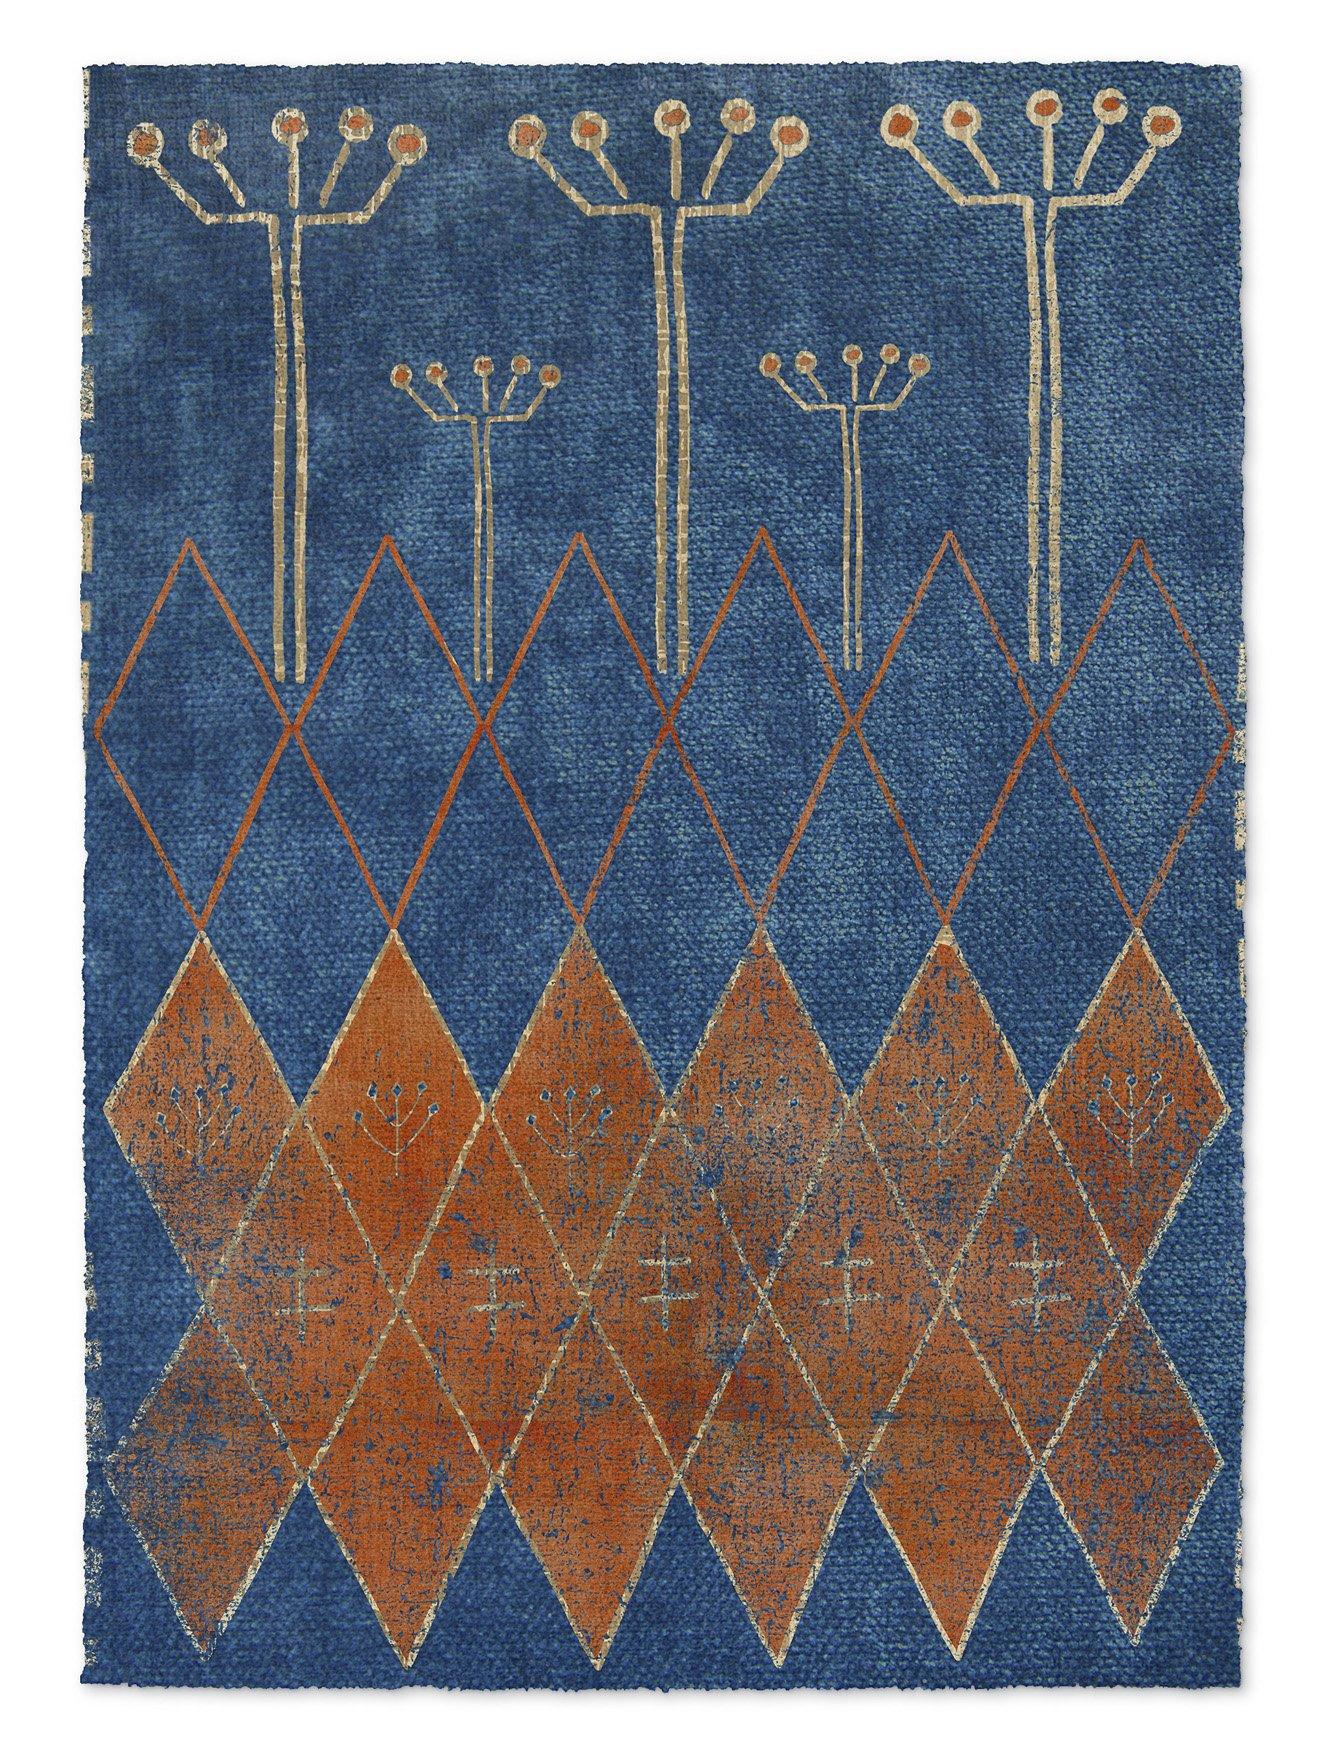 KAVKA Designs Mestara Area Rug, (Blue/Orange) - NAVAJO Collection, Size: 8x10x.5 - (TELAVC8089RUG810)